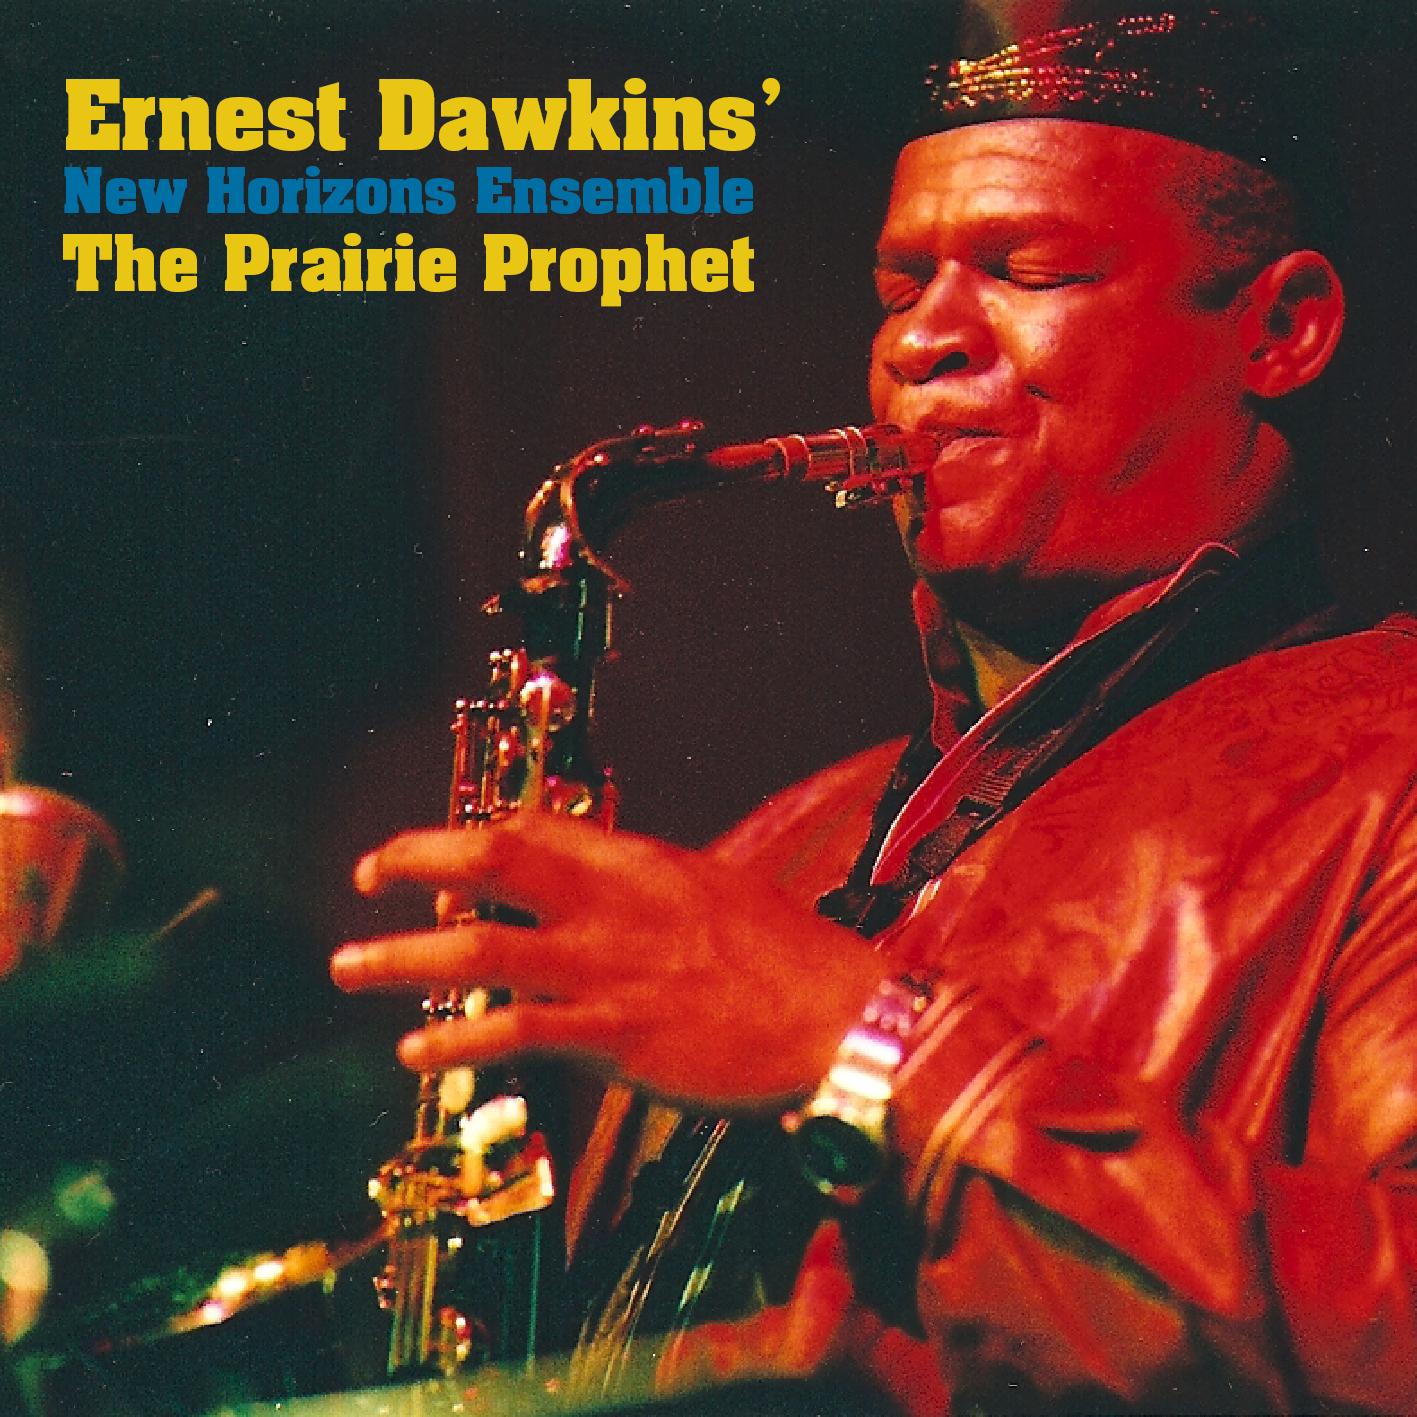 Ernest Dawkins' New Horizons Ensemble - The Prairie Prophet